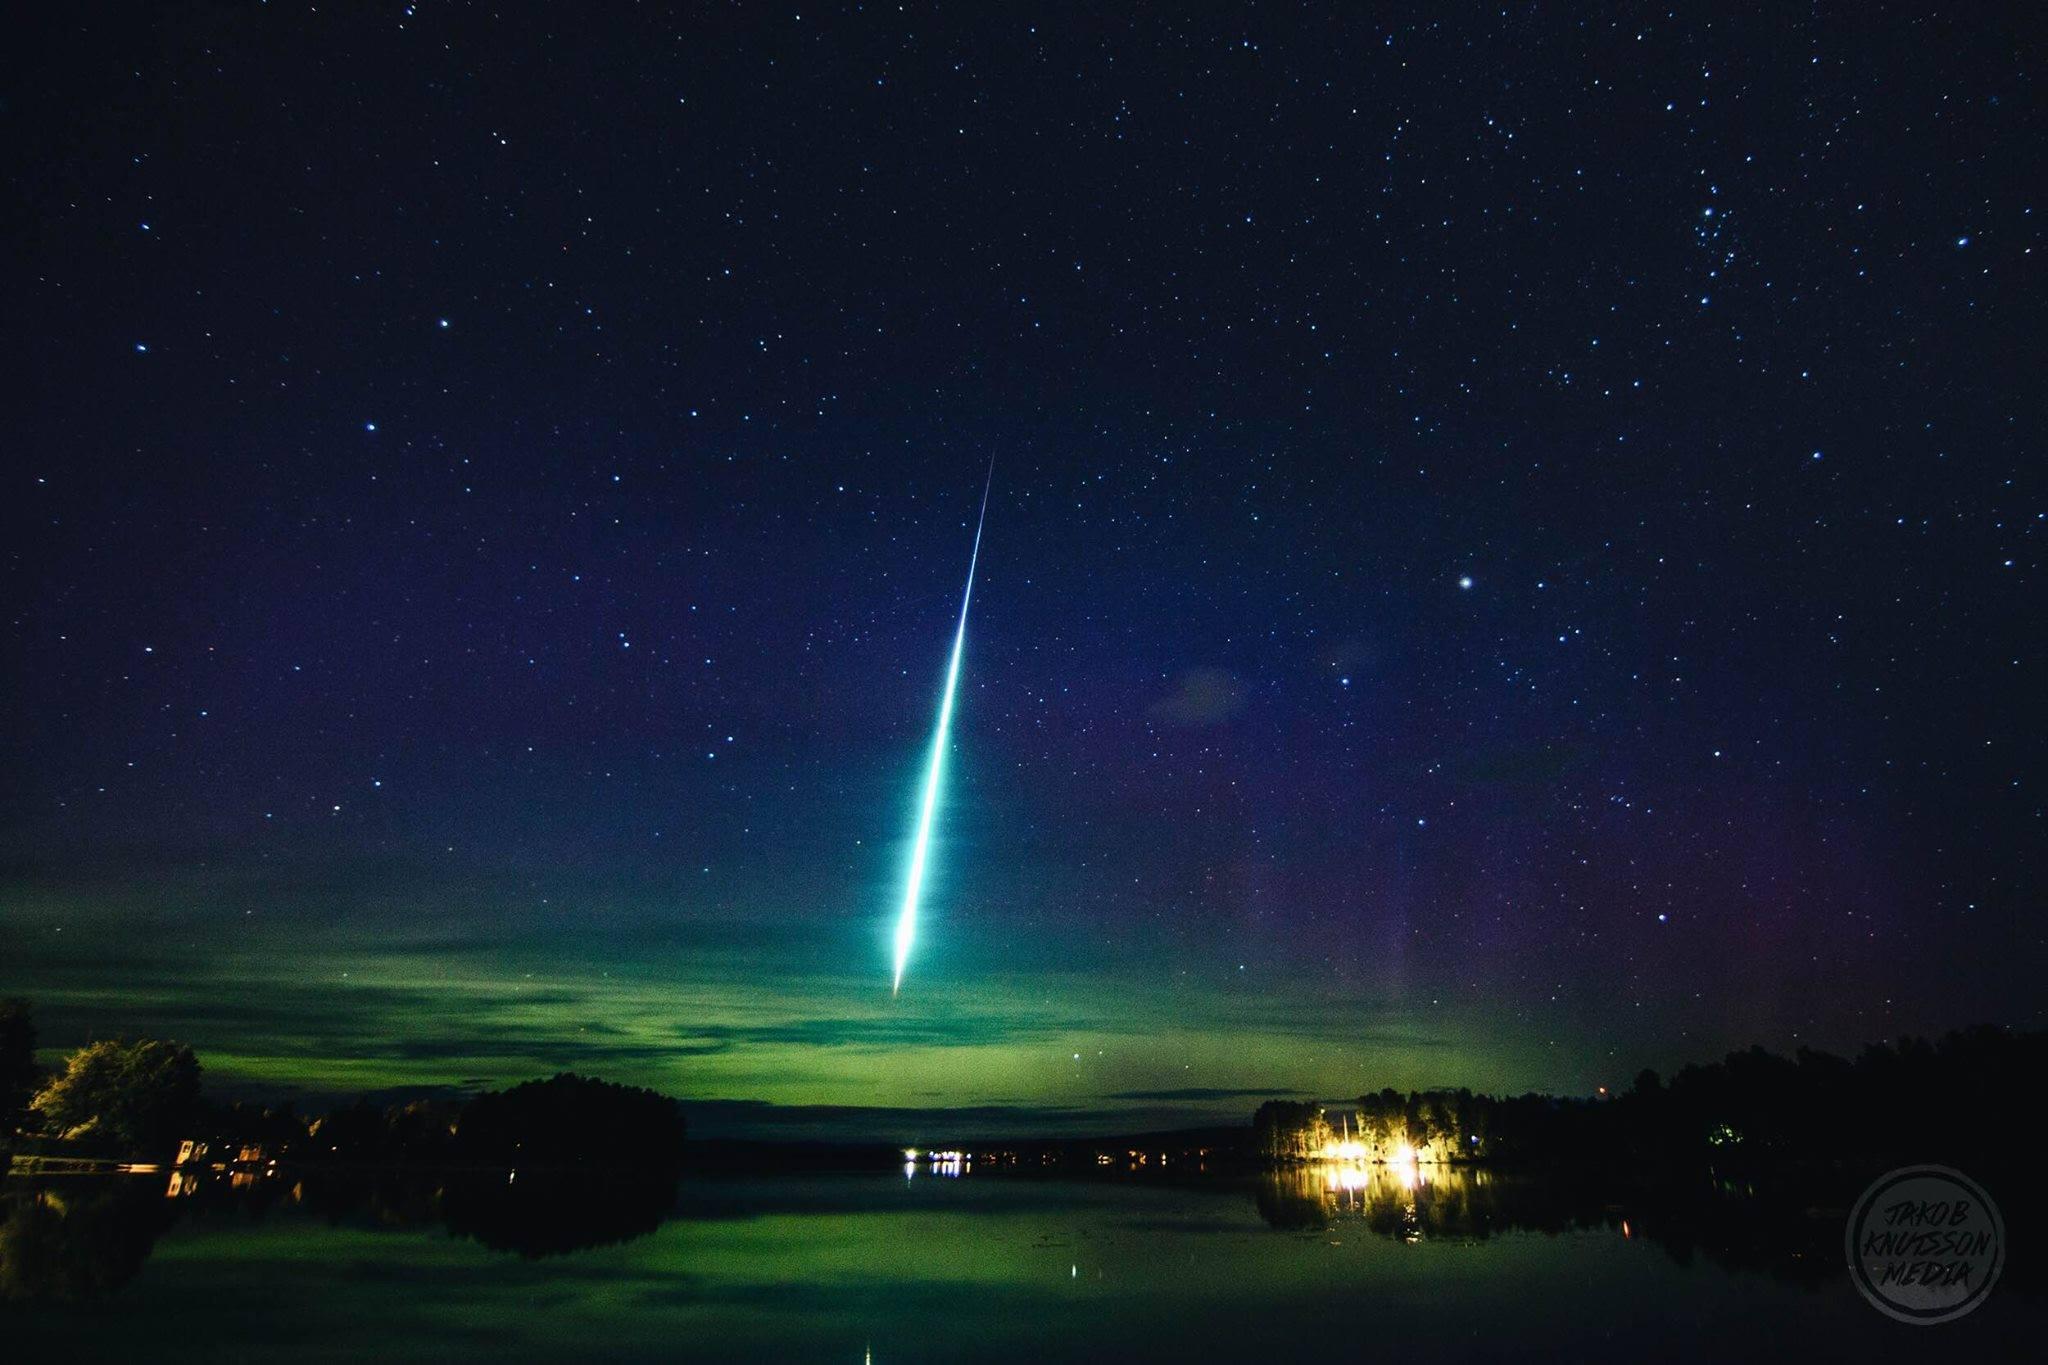 Картинка с метеором